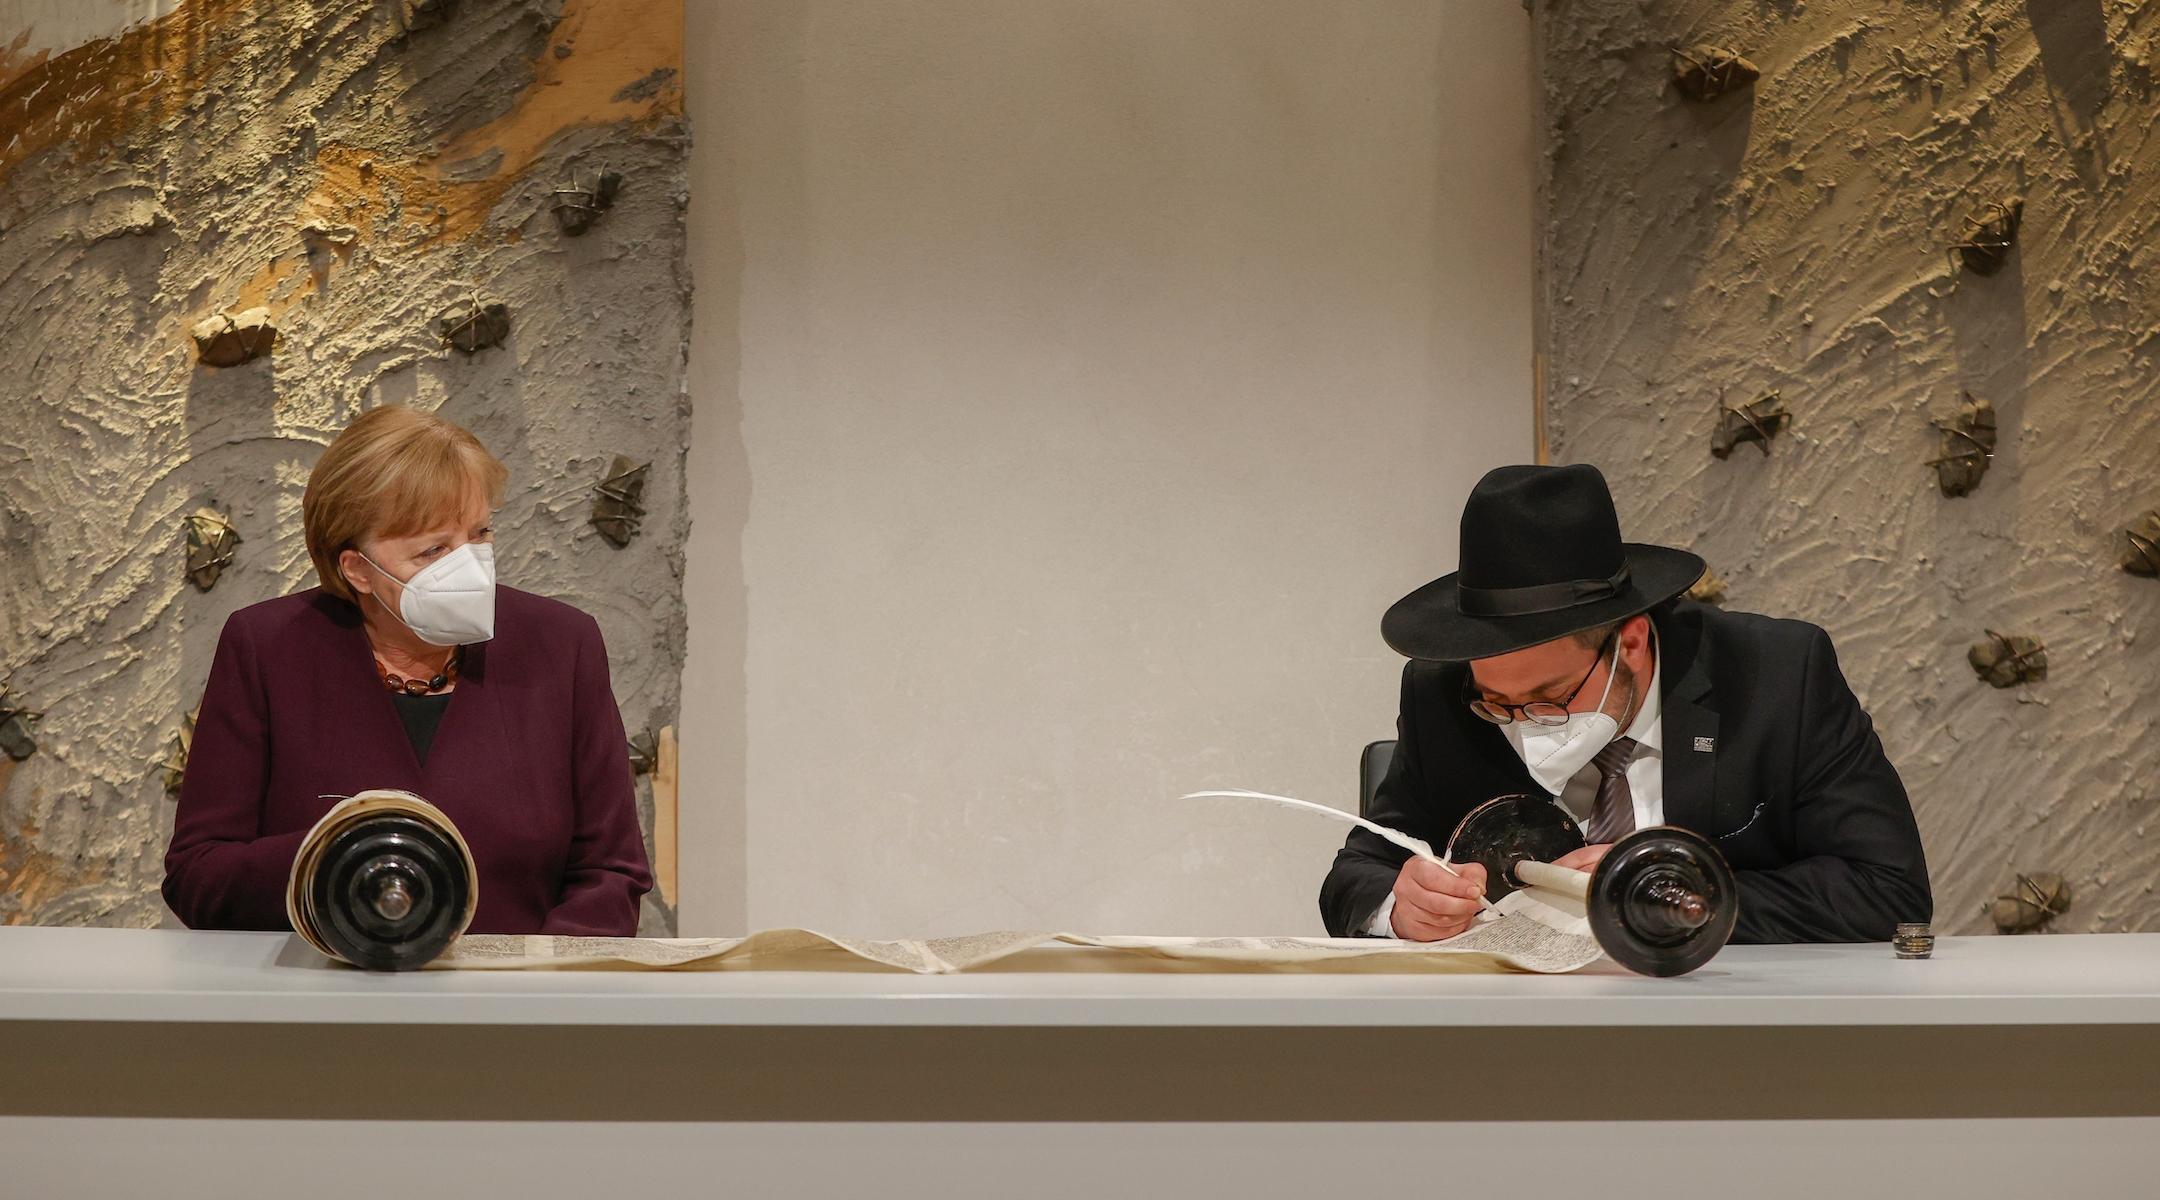 Angela Merkel participates in historic Torah scroll writing ceremony